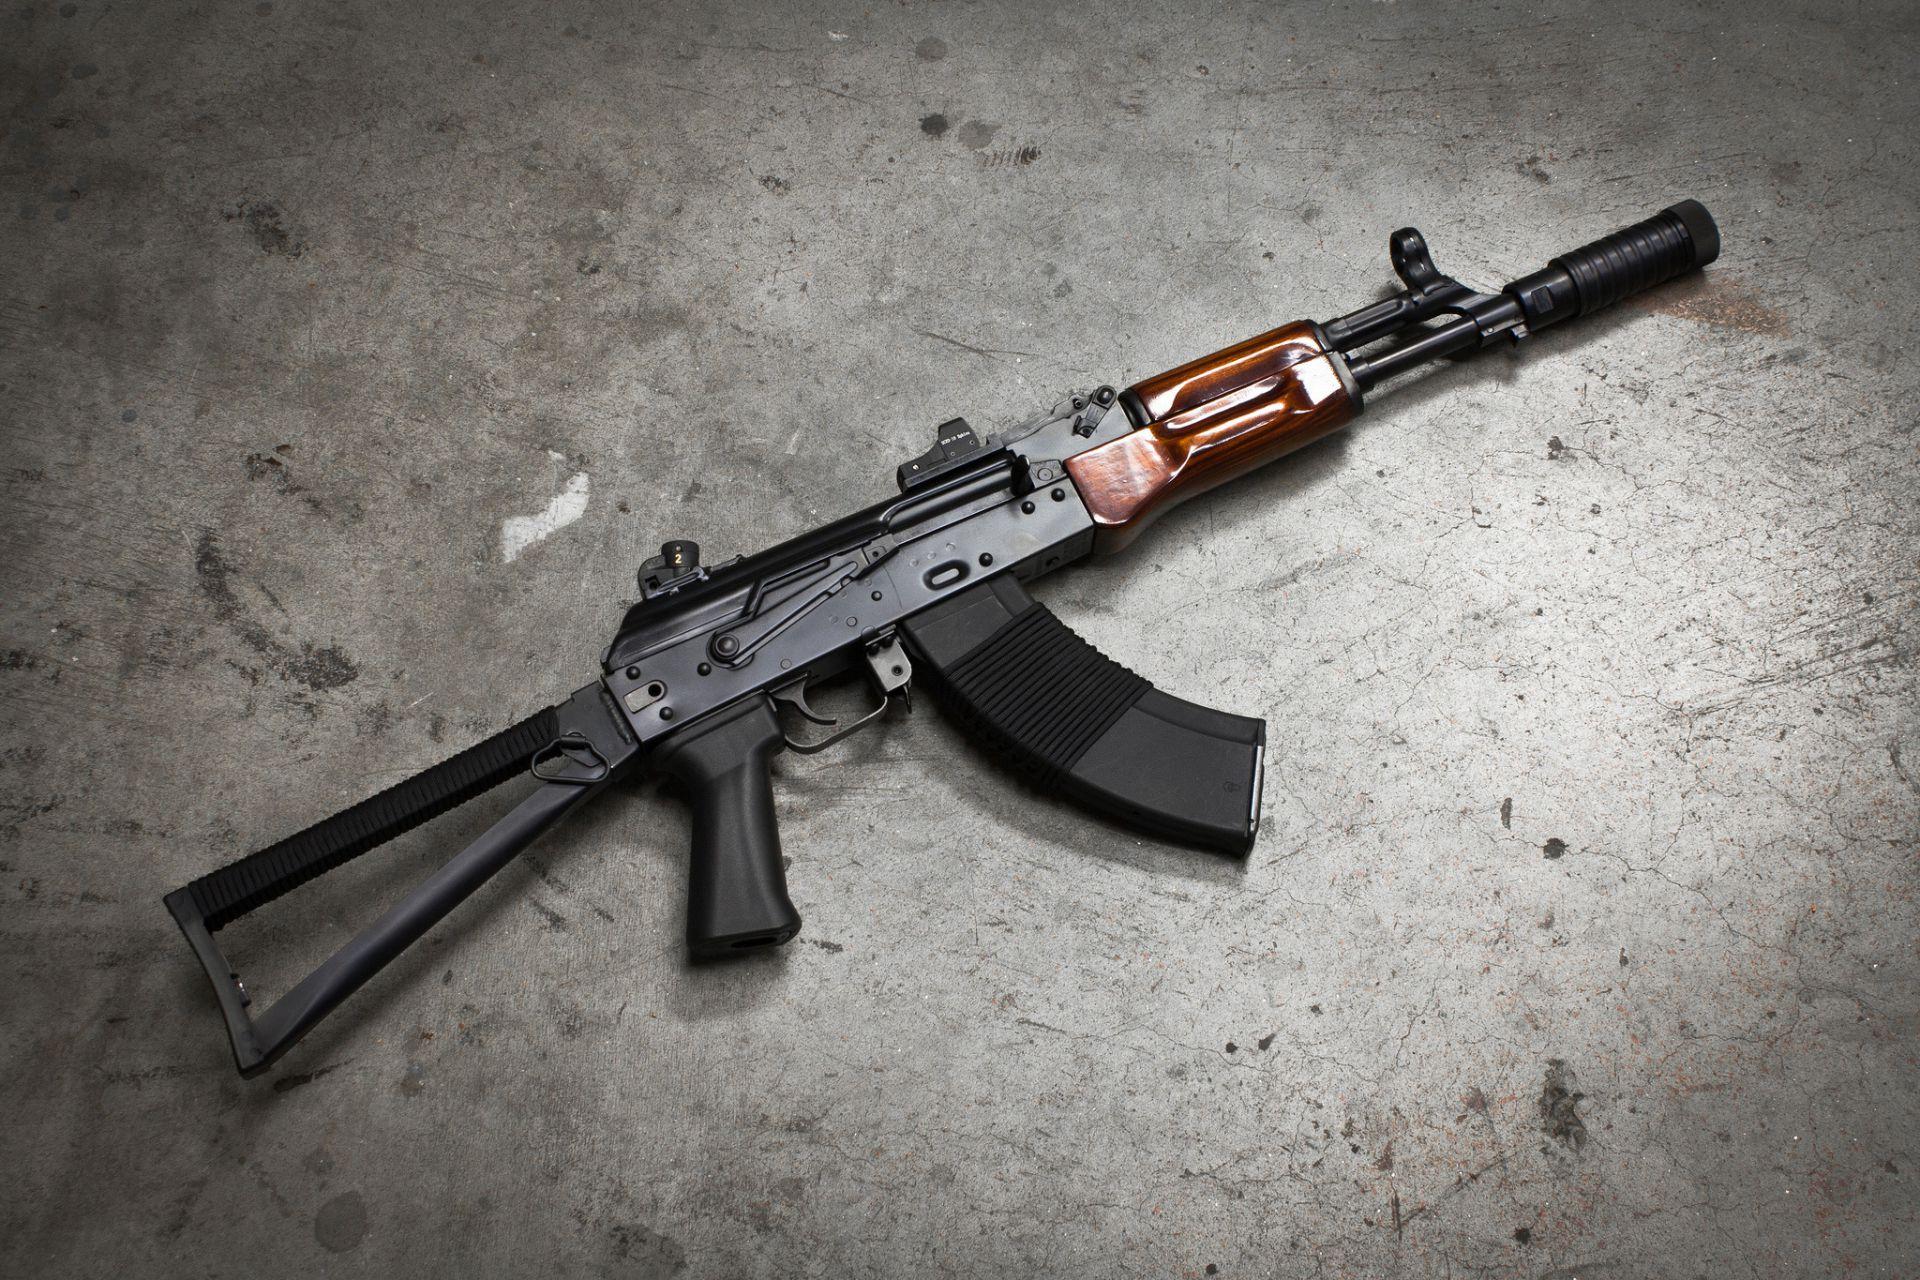 Kalashnikov Assault Rifle: the Evolution of a Masterpiece